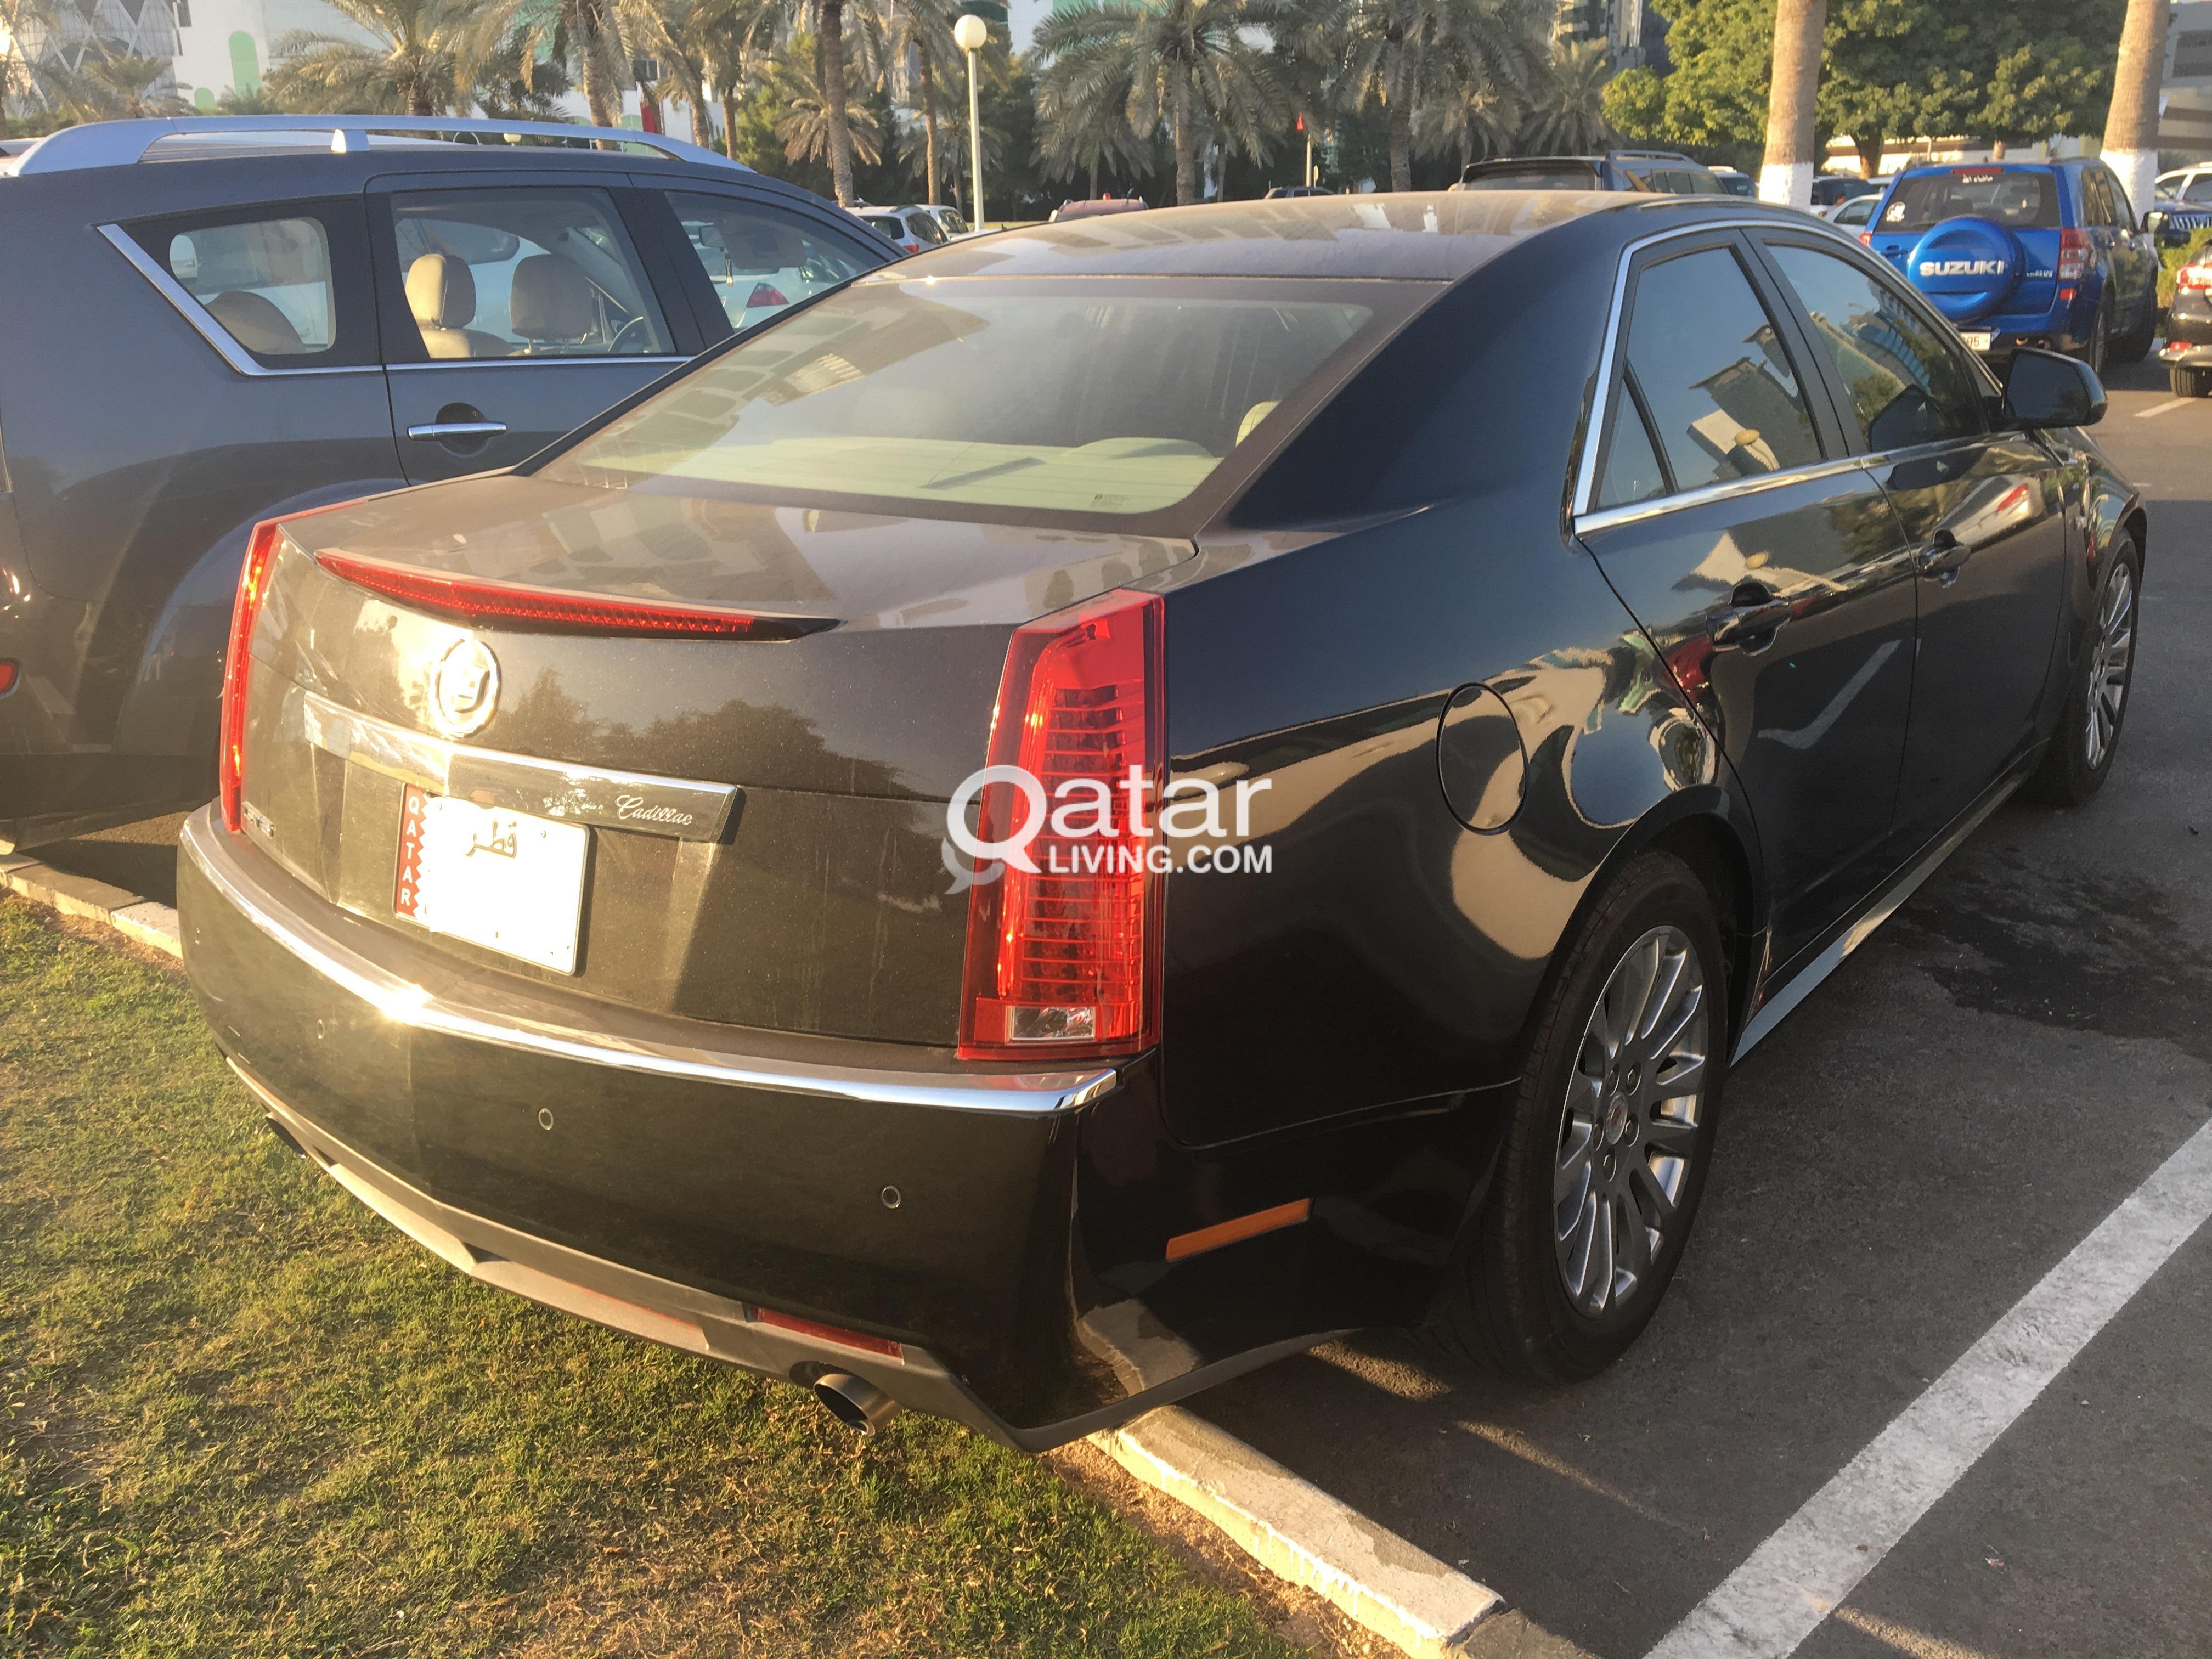 img information sale for vehicles model cts cadillac qatar option living carsedan mid